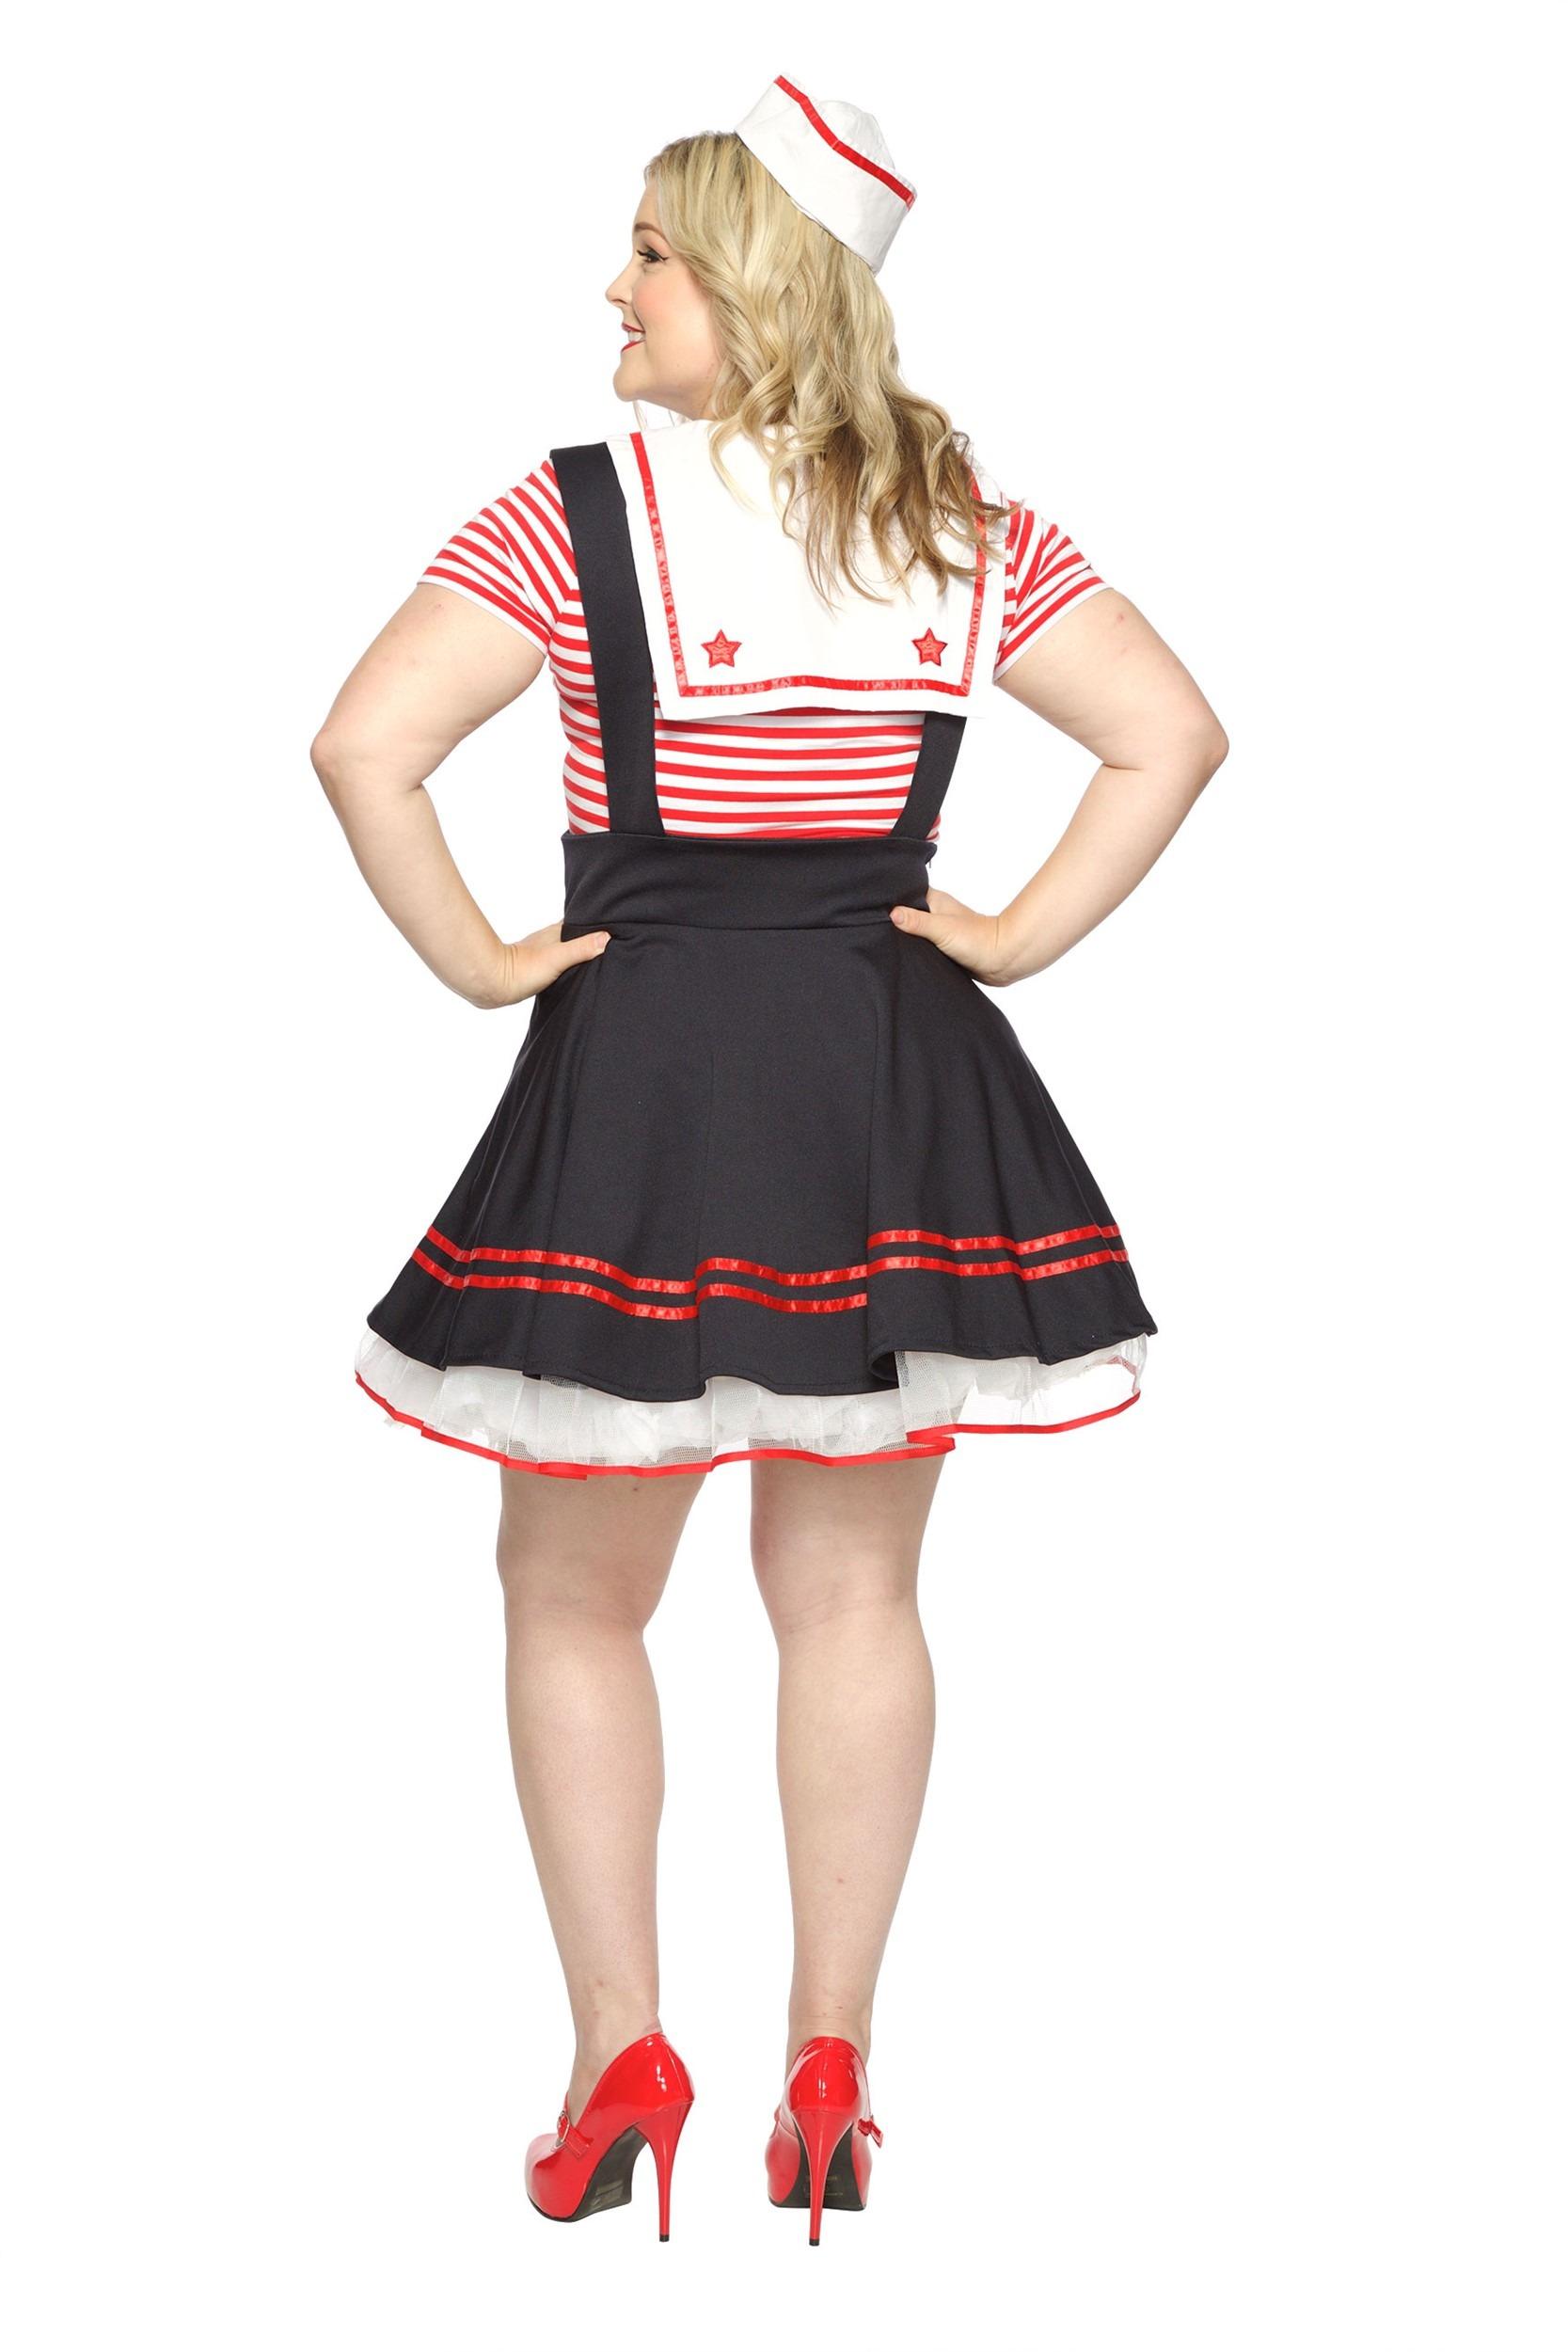 457acd87eca8e ... Update Main Women s Plus Size Retro Sailor Girl Costume ALt1